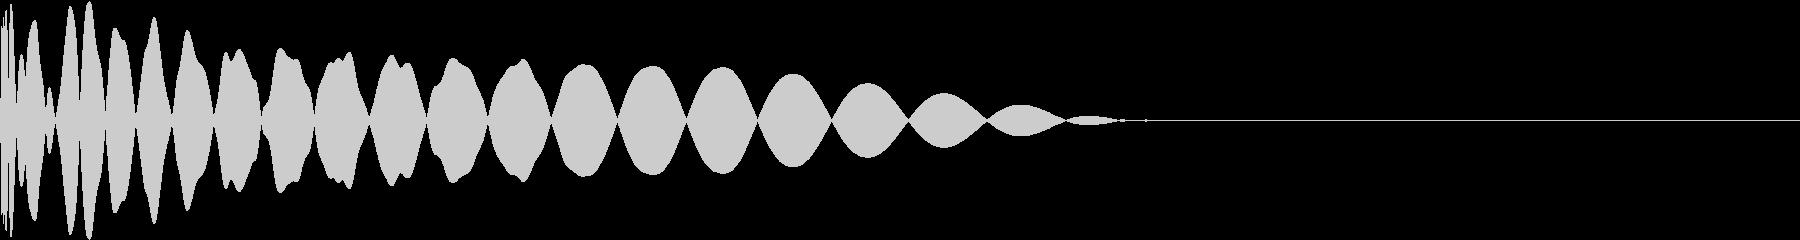 DTM Kick 34 オリジナル音源の未再生の波形